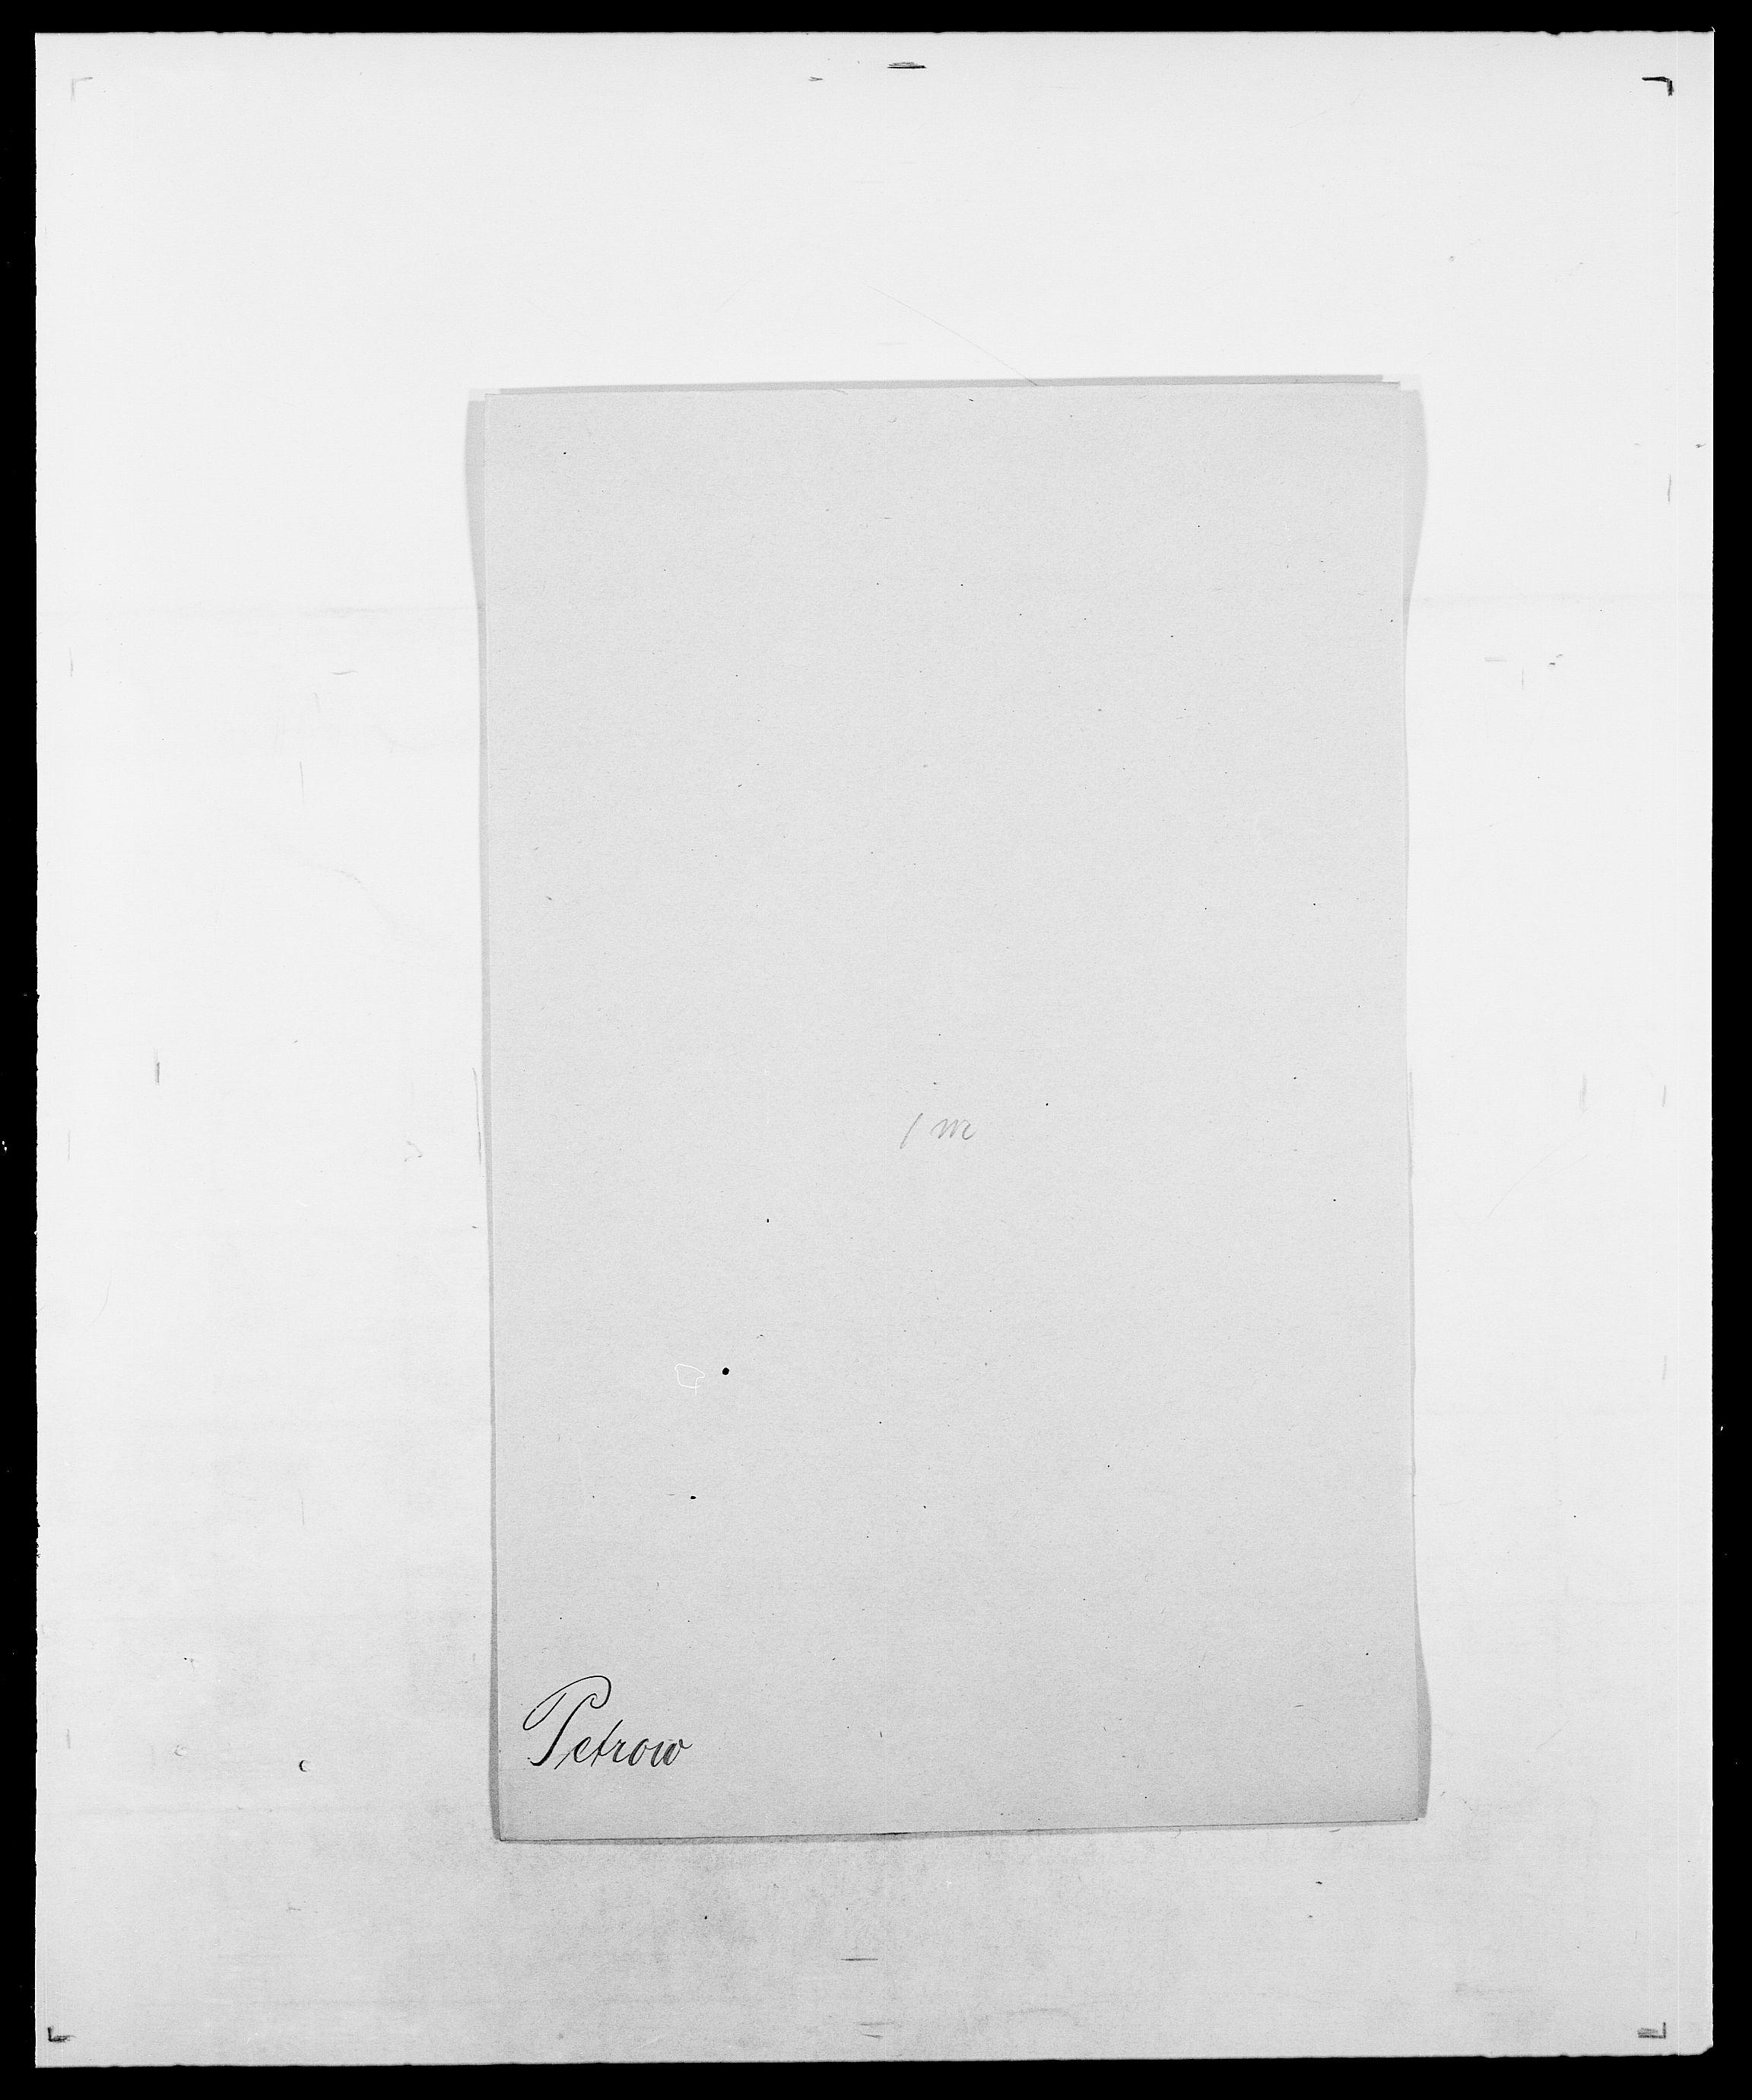 SAO, Delgobe, Charles Antoine - samling, D/Da/L0030: Paars - Pittelkov, s. 461